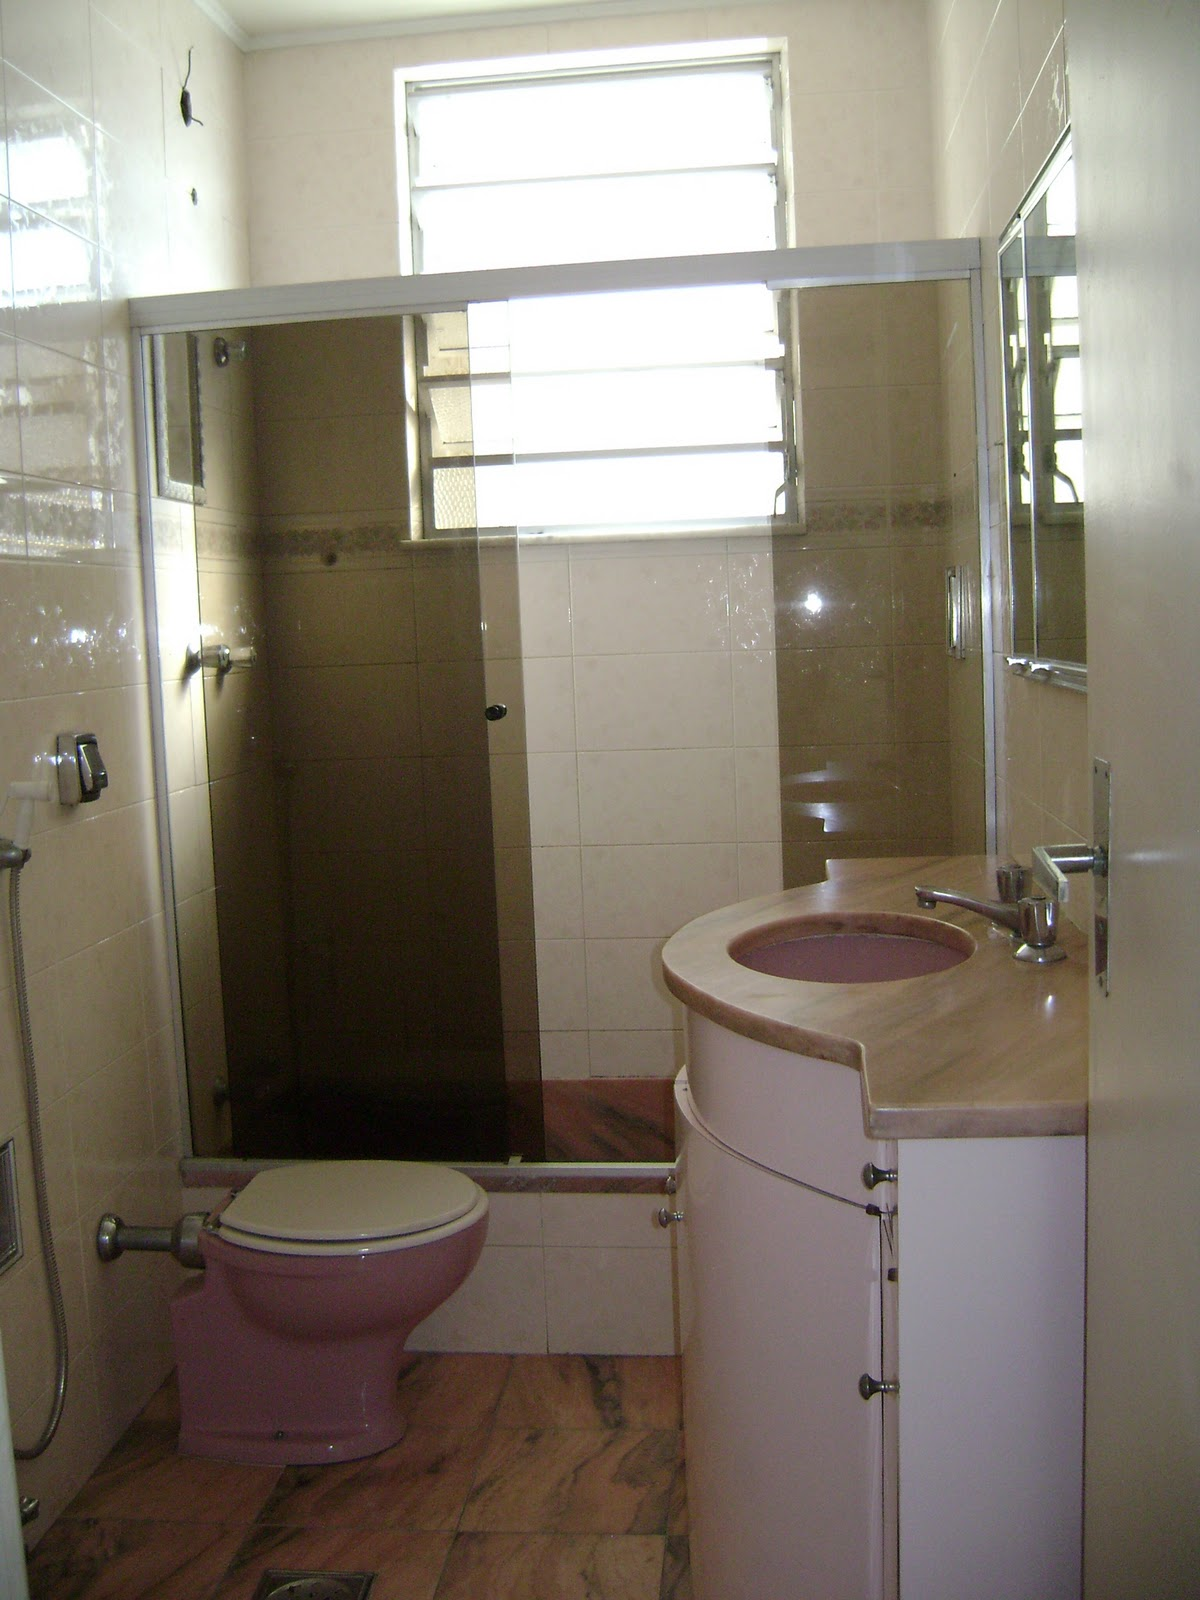 Travel and House: Banheiro = Banheiro   Lavabo #3A2C1F 1200 1600